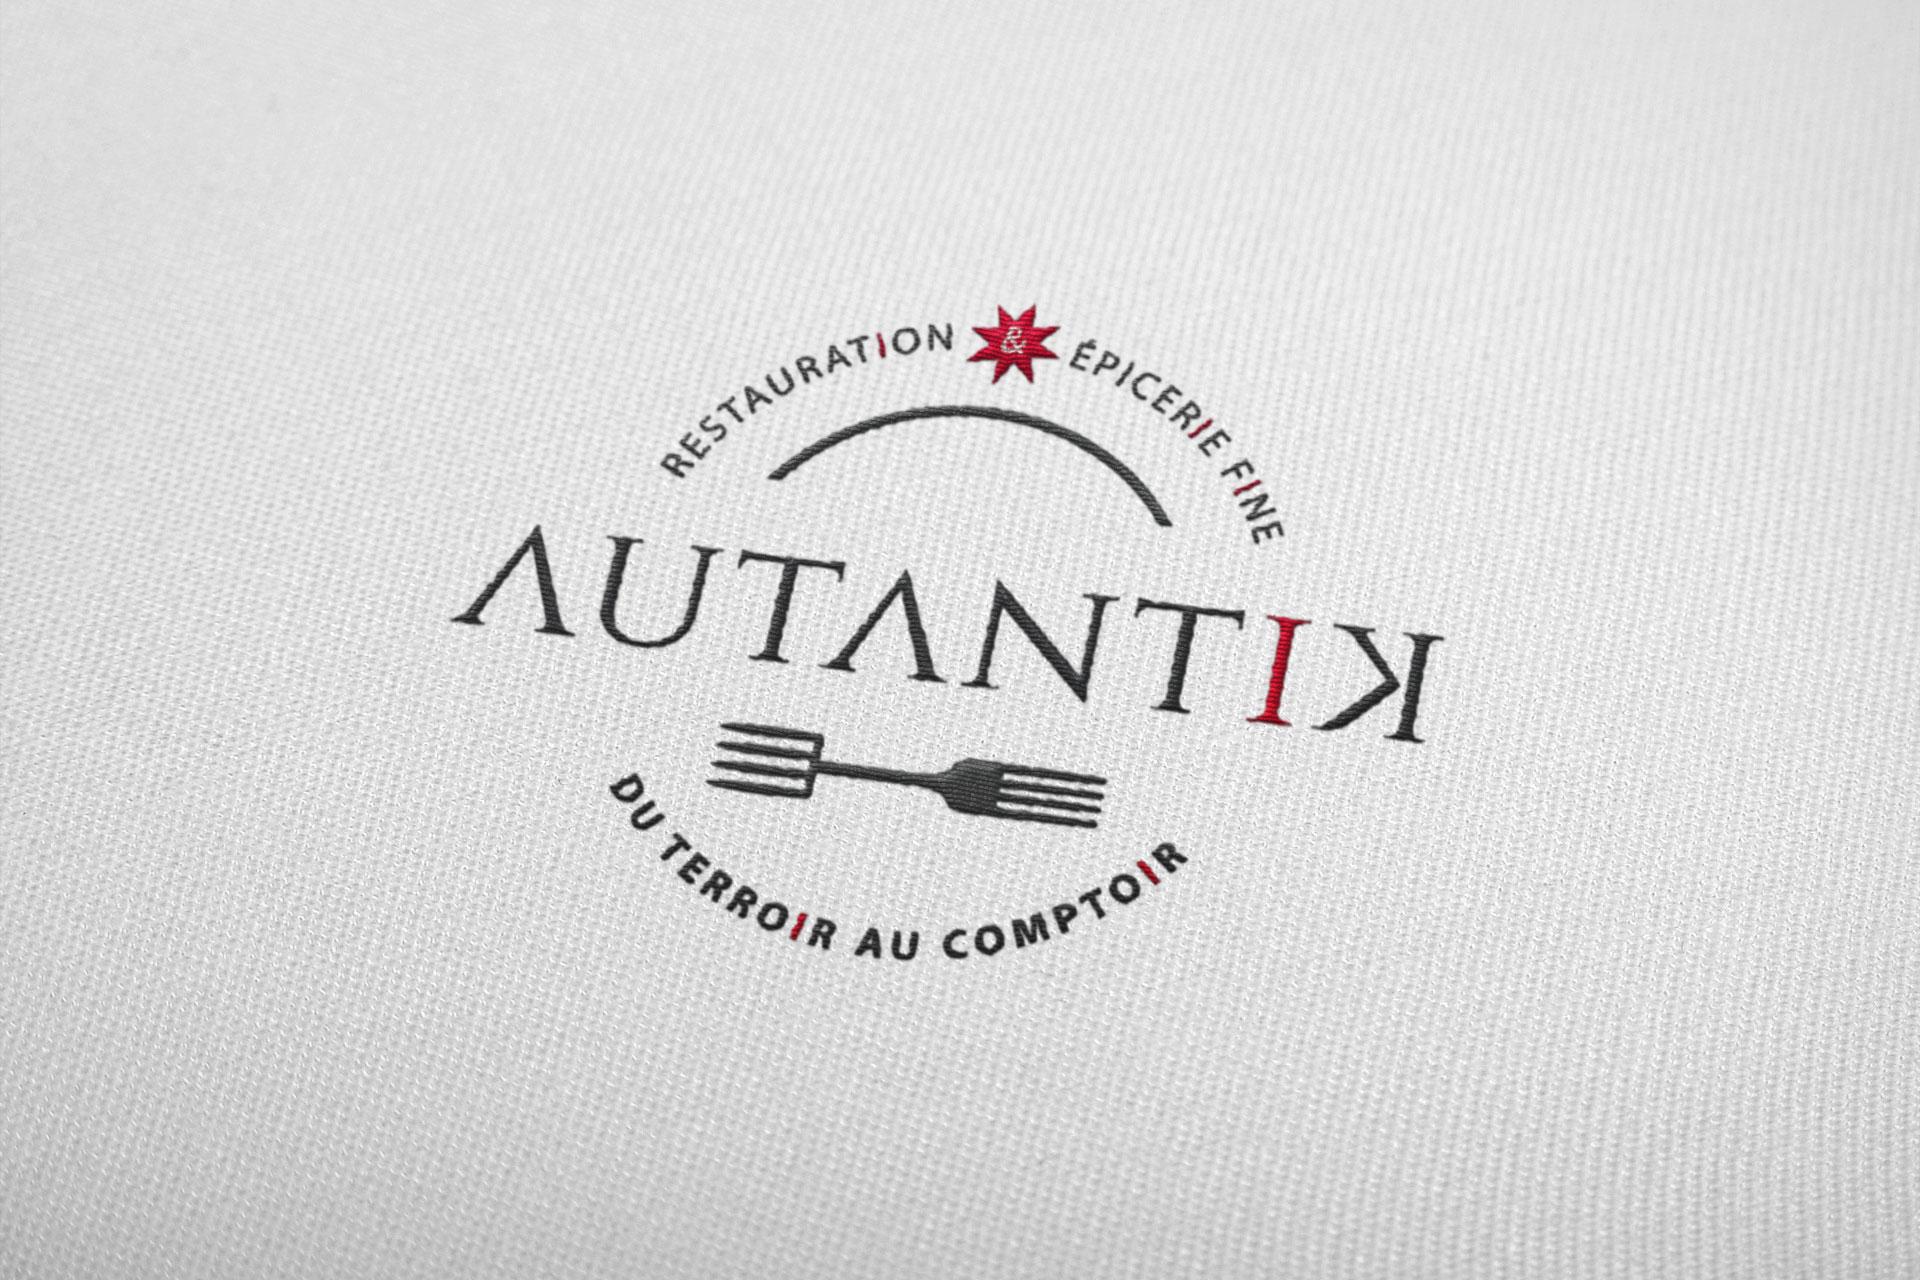 Simulation broderie du logotype Autantik